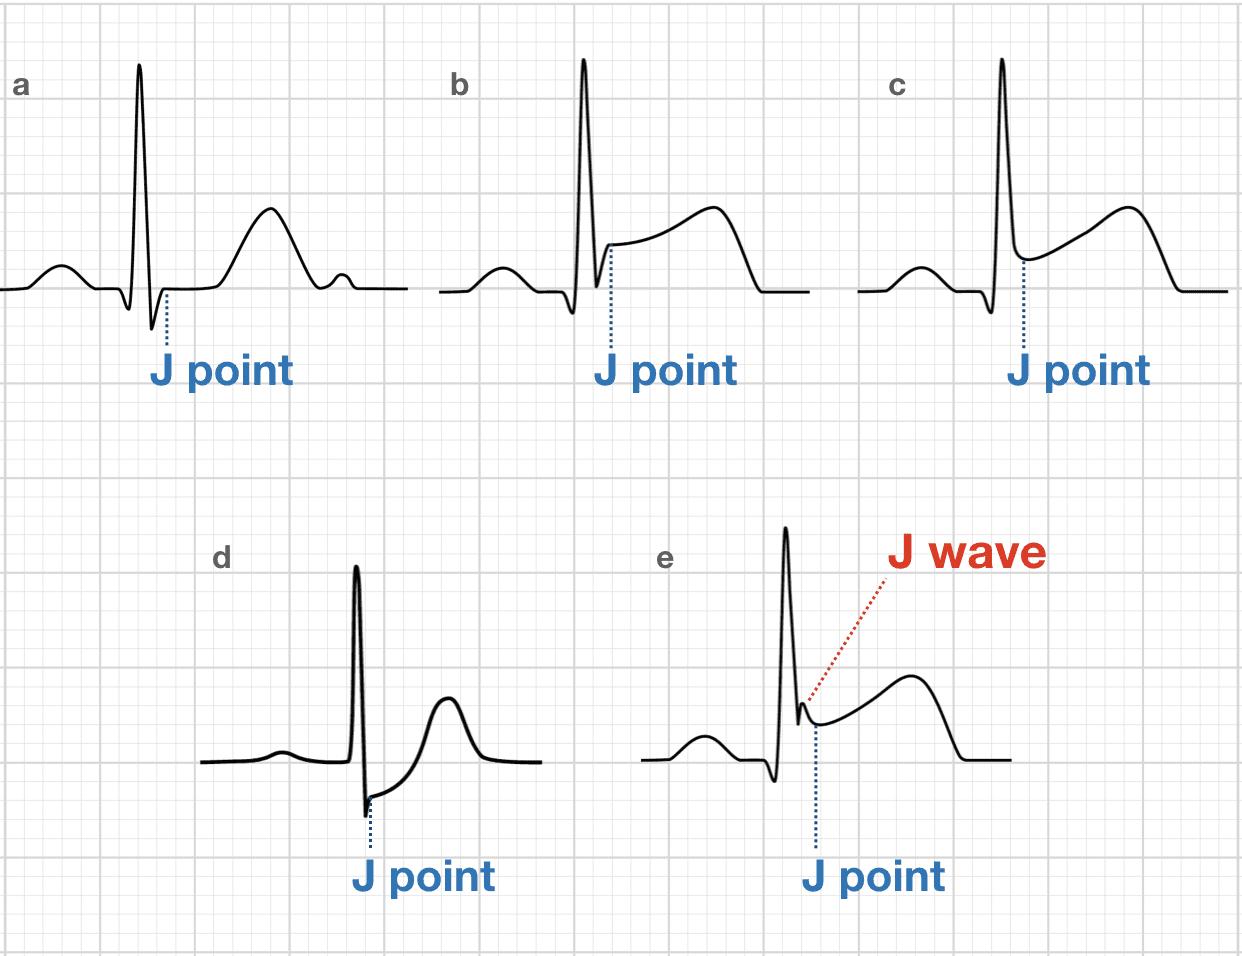 J Point Ecg Interval Litfl Medical Blog Ecg Library Basics